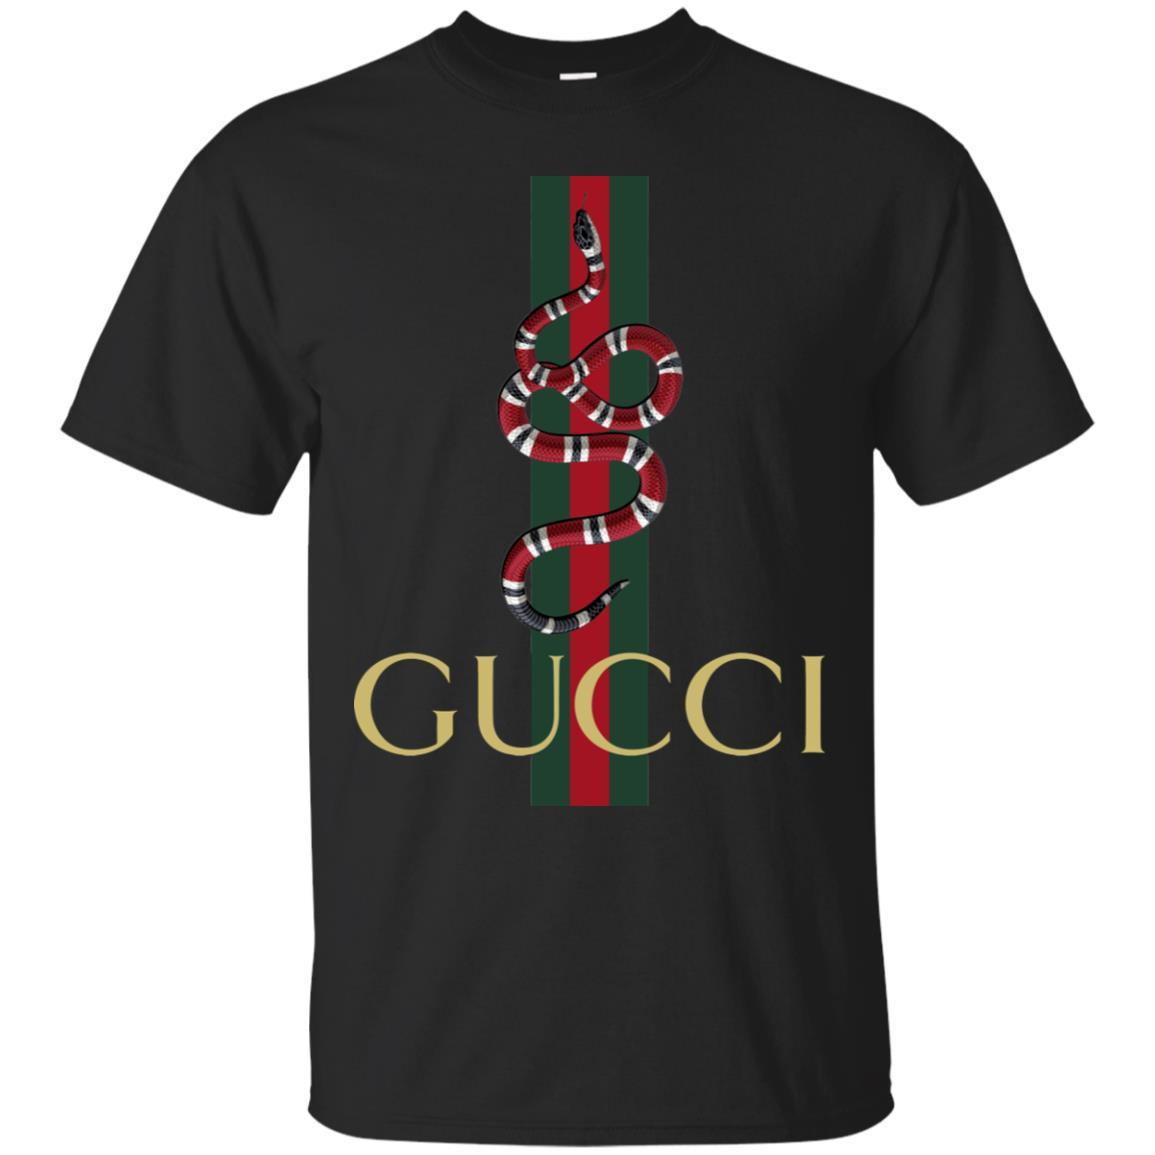 3750c7f79 Gucci Snake shirt - image 4036 510x510